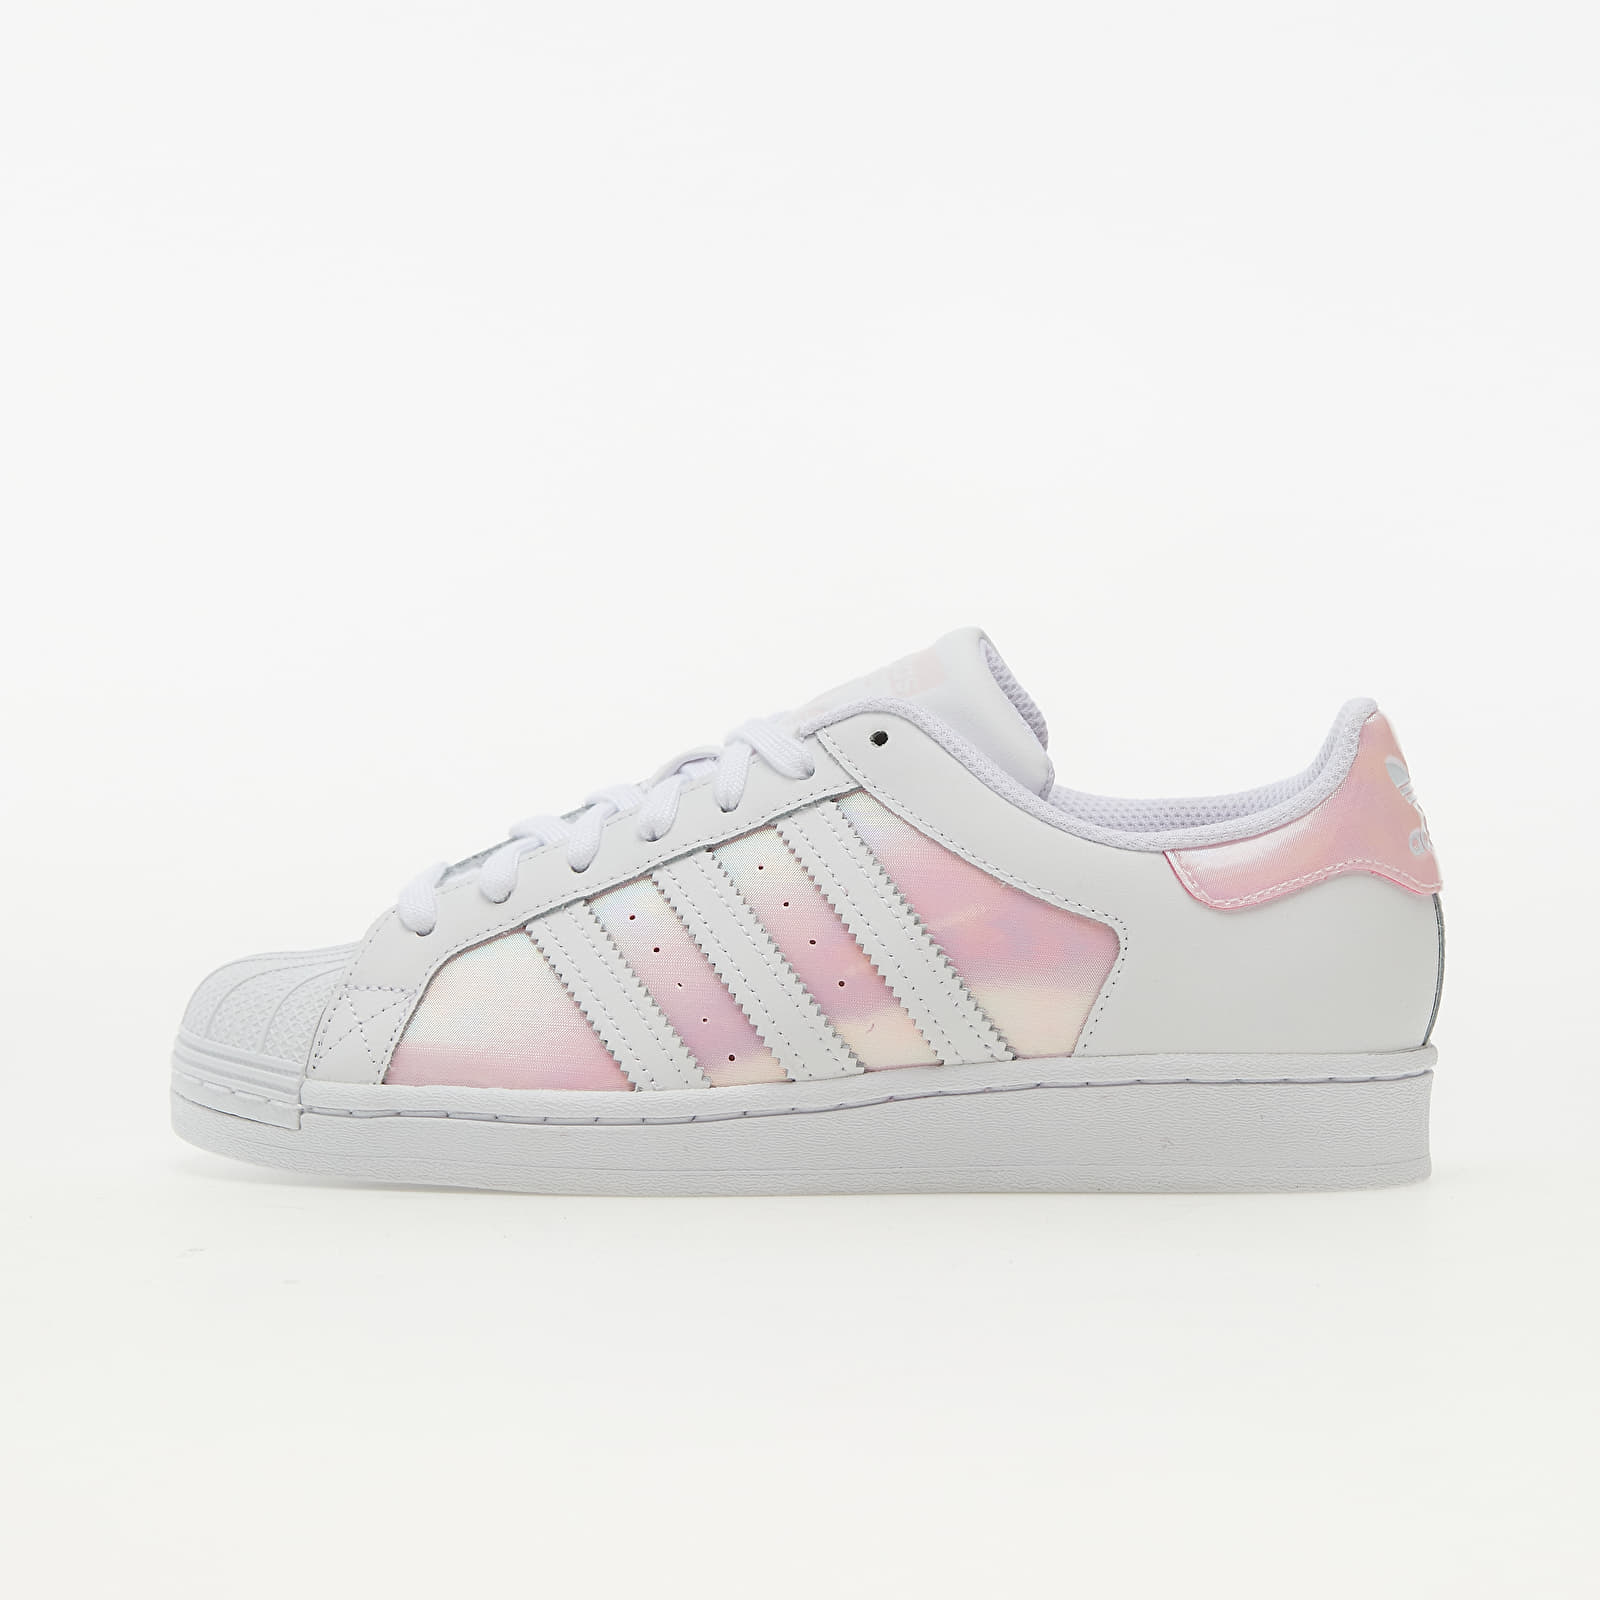 adidas Superstar W Ftw White/ Ftw White/ Clear Pink FX6042